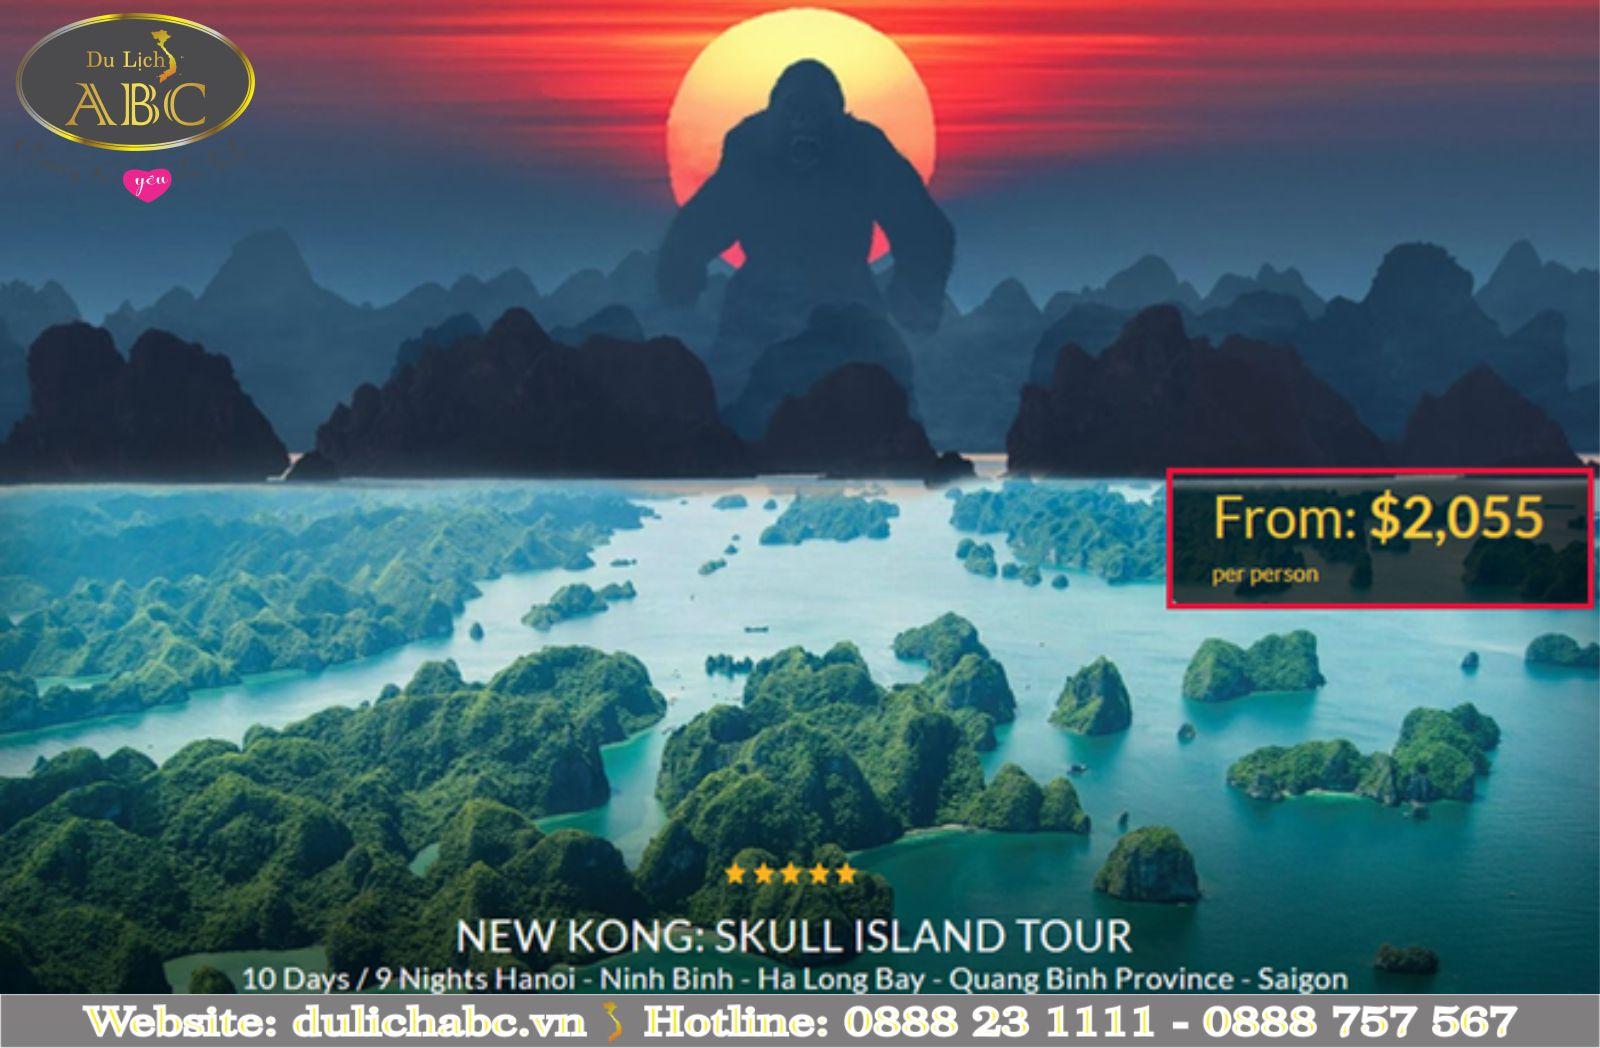 Tour Du Lịch Ăn Theo Film Kong: Skull Island